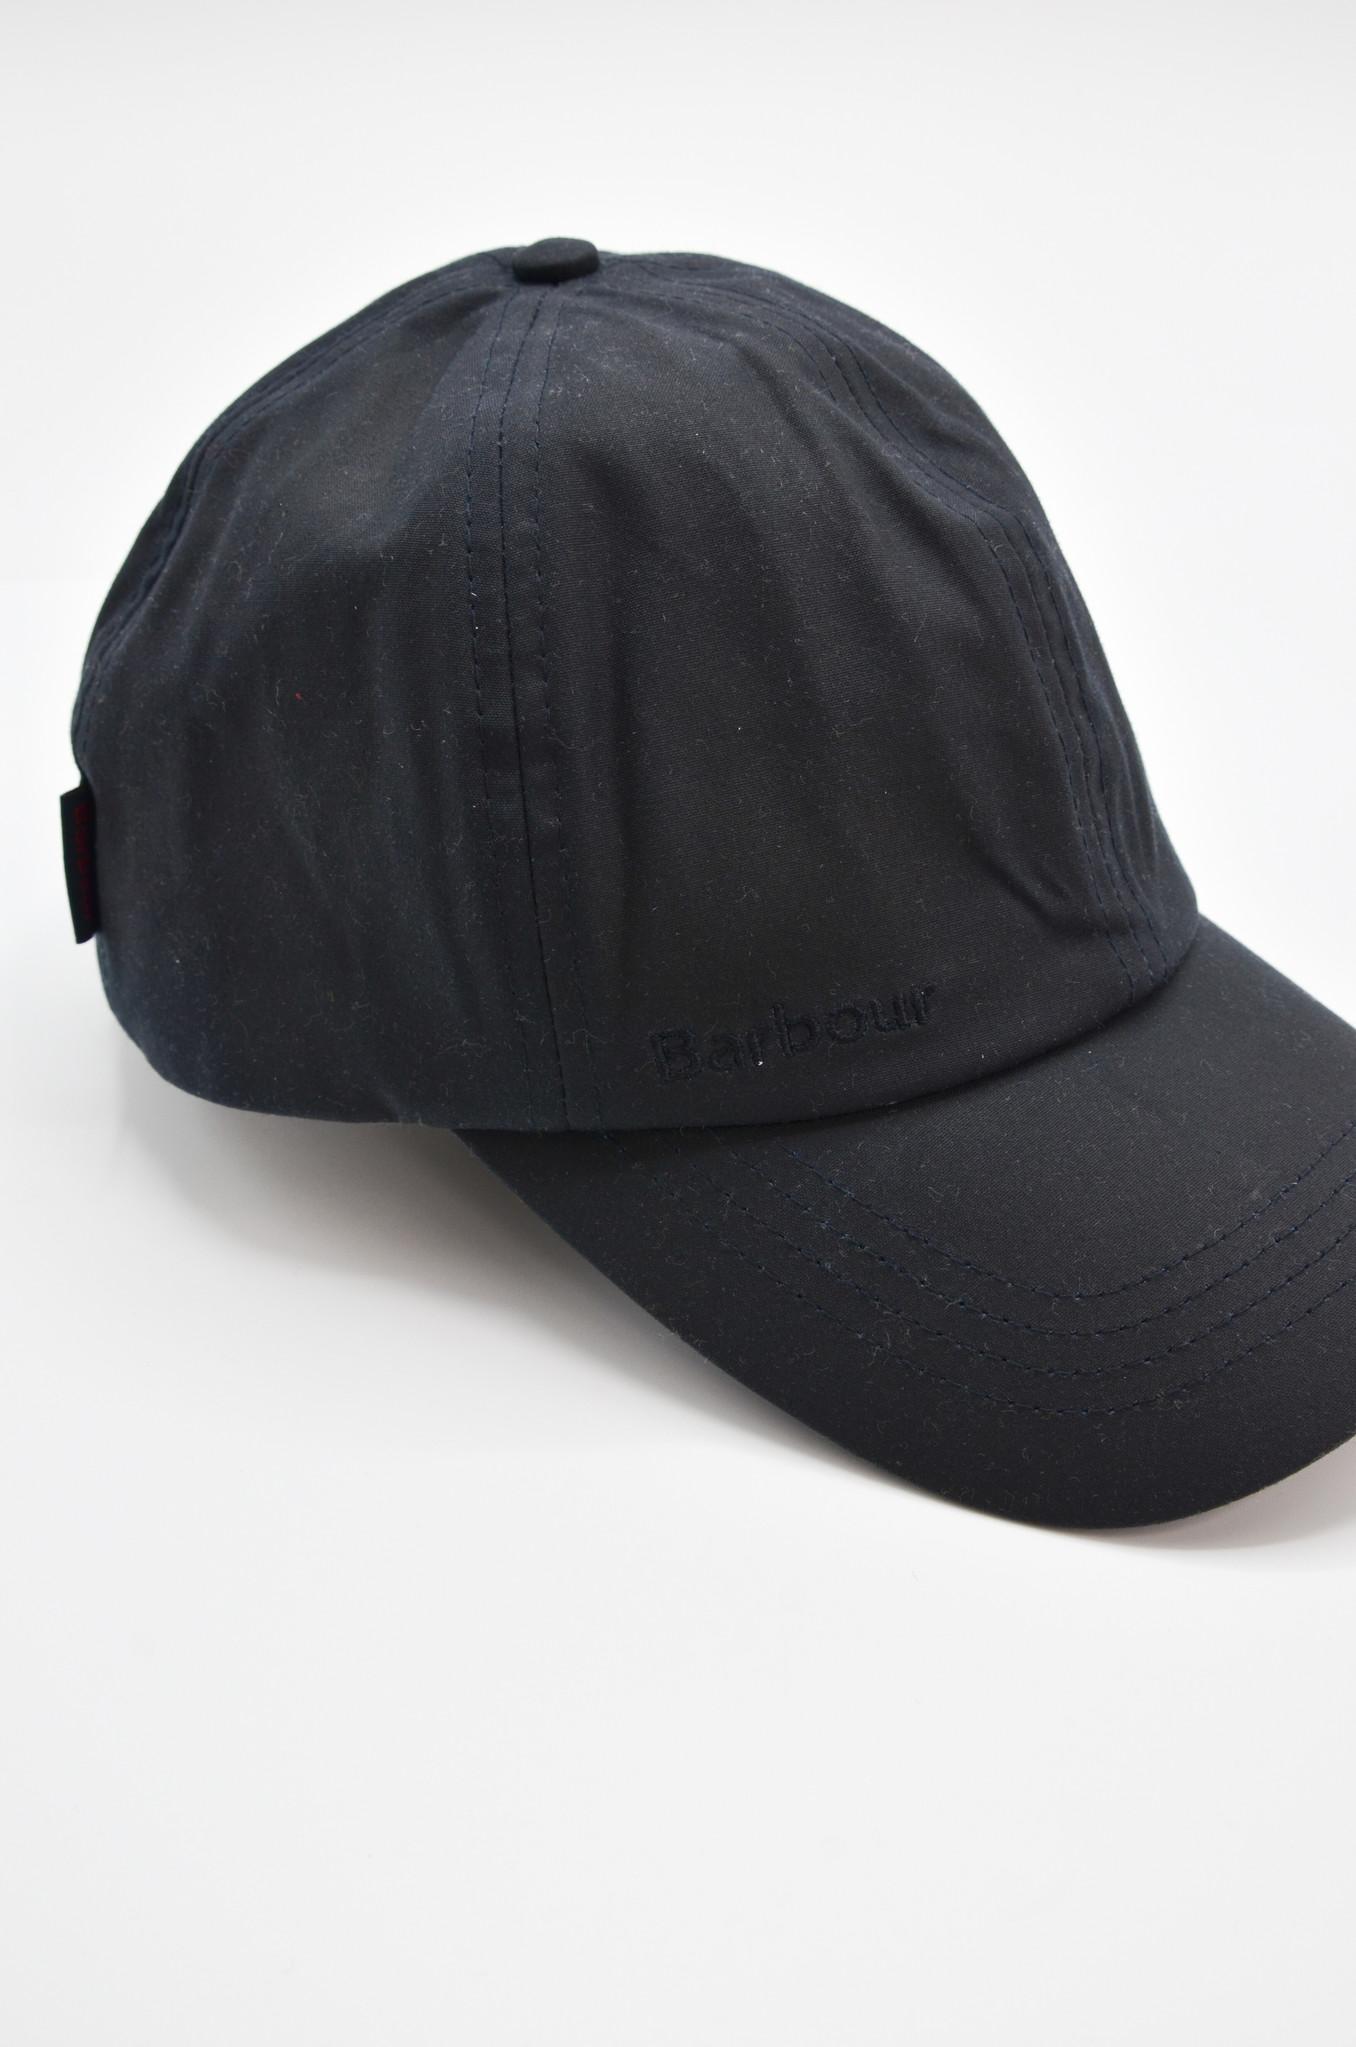 WAX SPORTS CAP IN NAVY-7